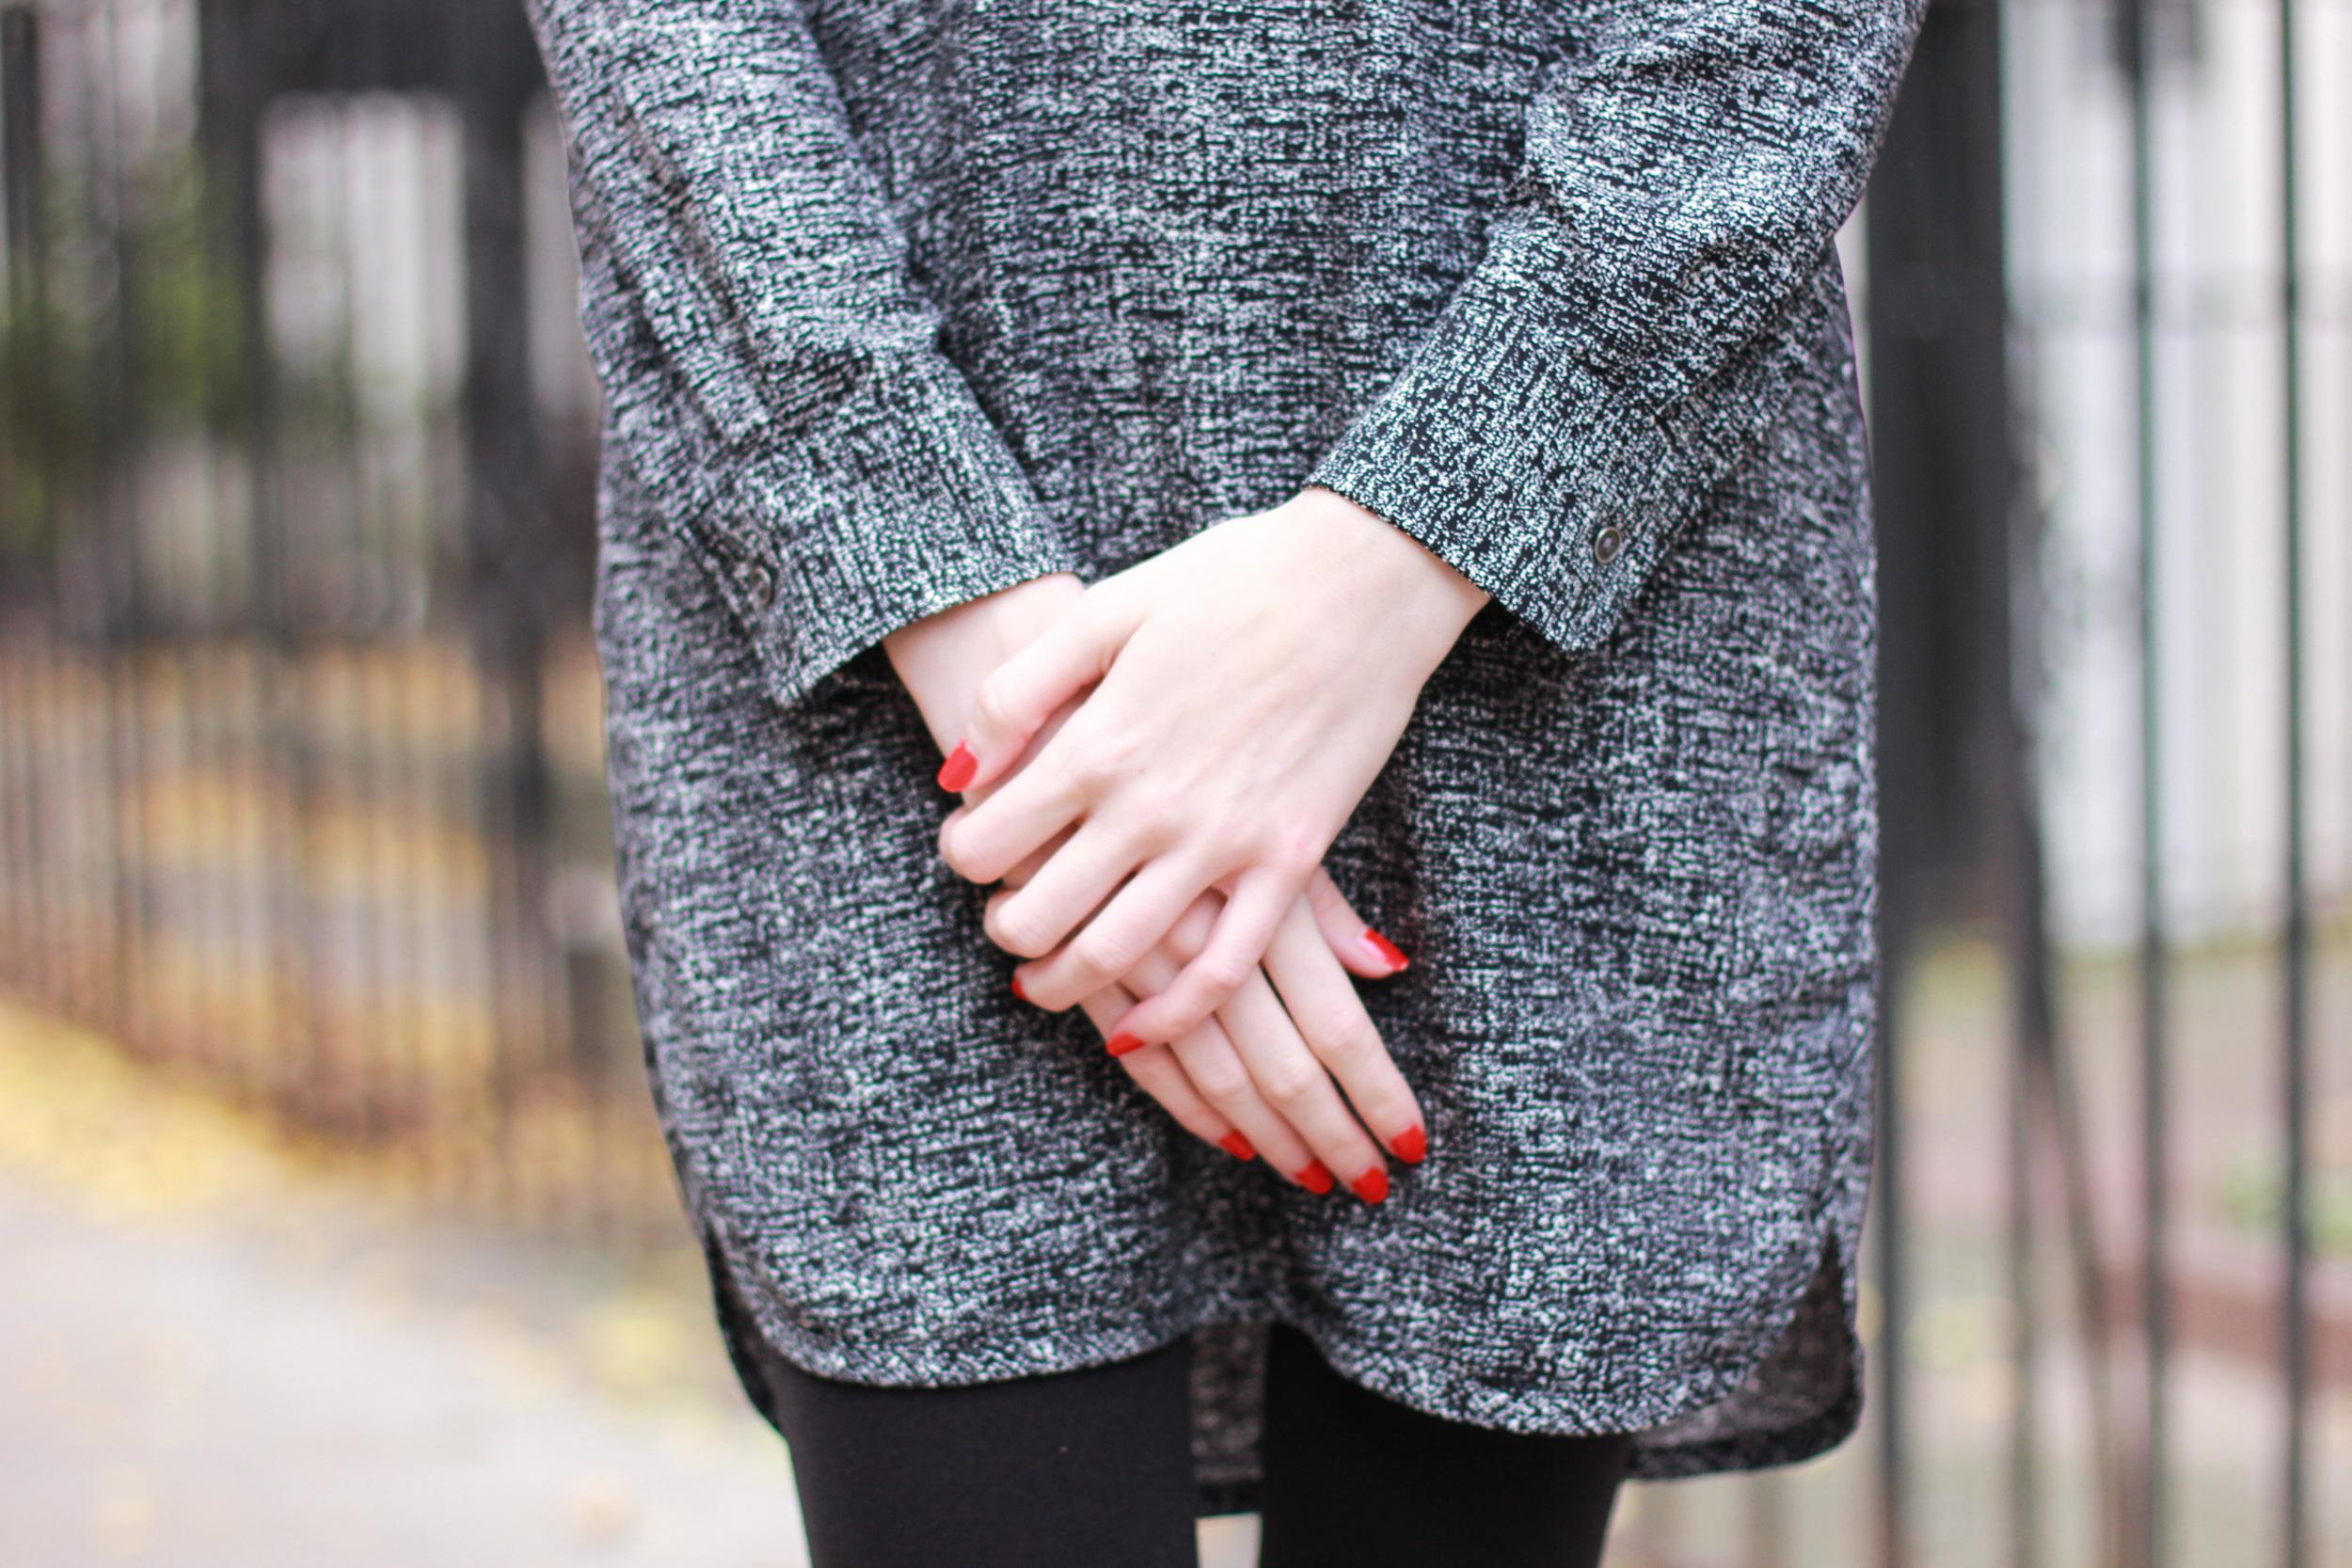 Lou & Grey shift dress, brown leather jacket, black ballet flats, gold ponytail holder, diamond drop earrings, clinique color pop lipstick in Poppy Pop, essie polish in geranium